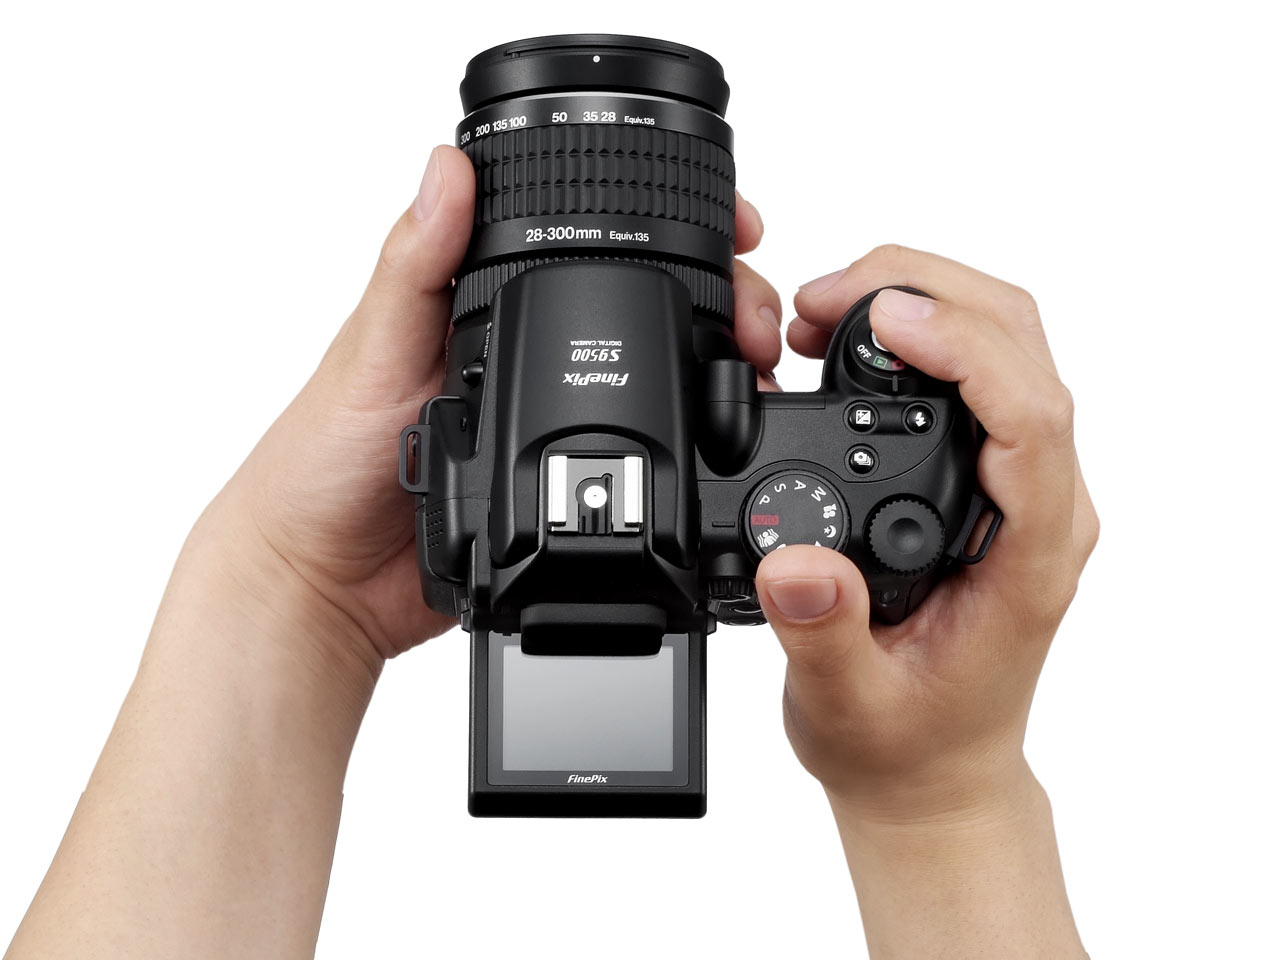 fujifilm finepix s9000 s9500 zoom digital photography review rh dpreview com